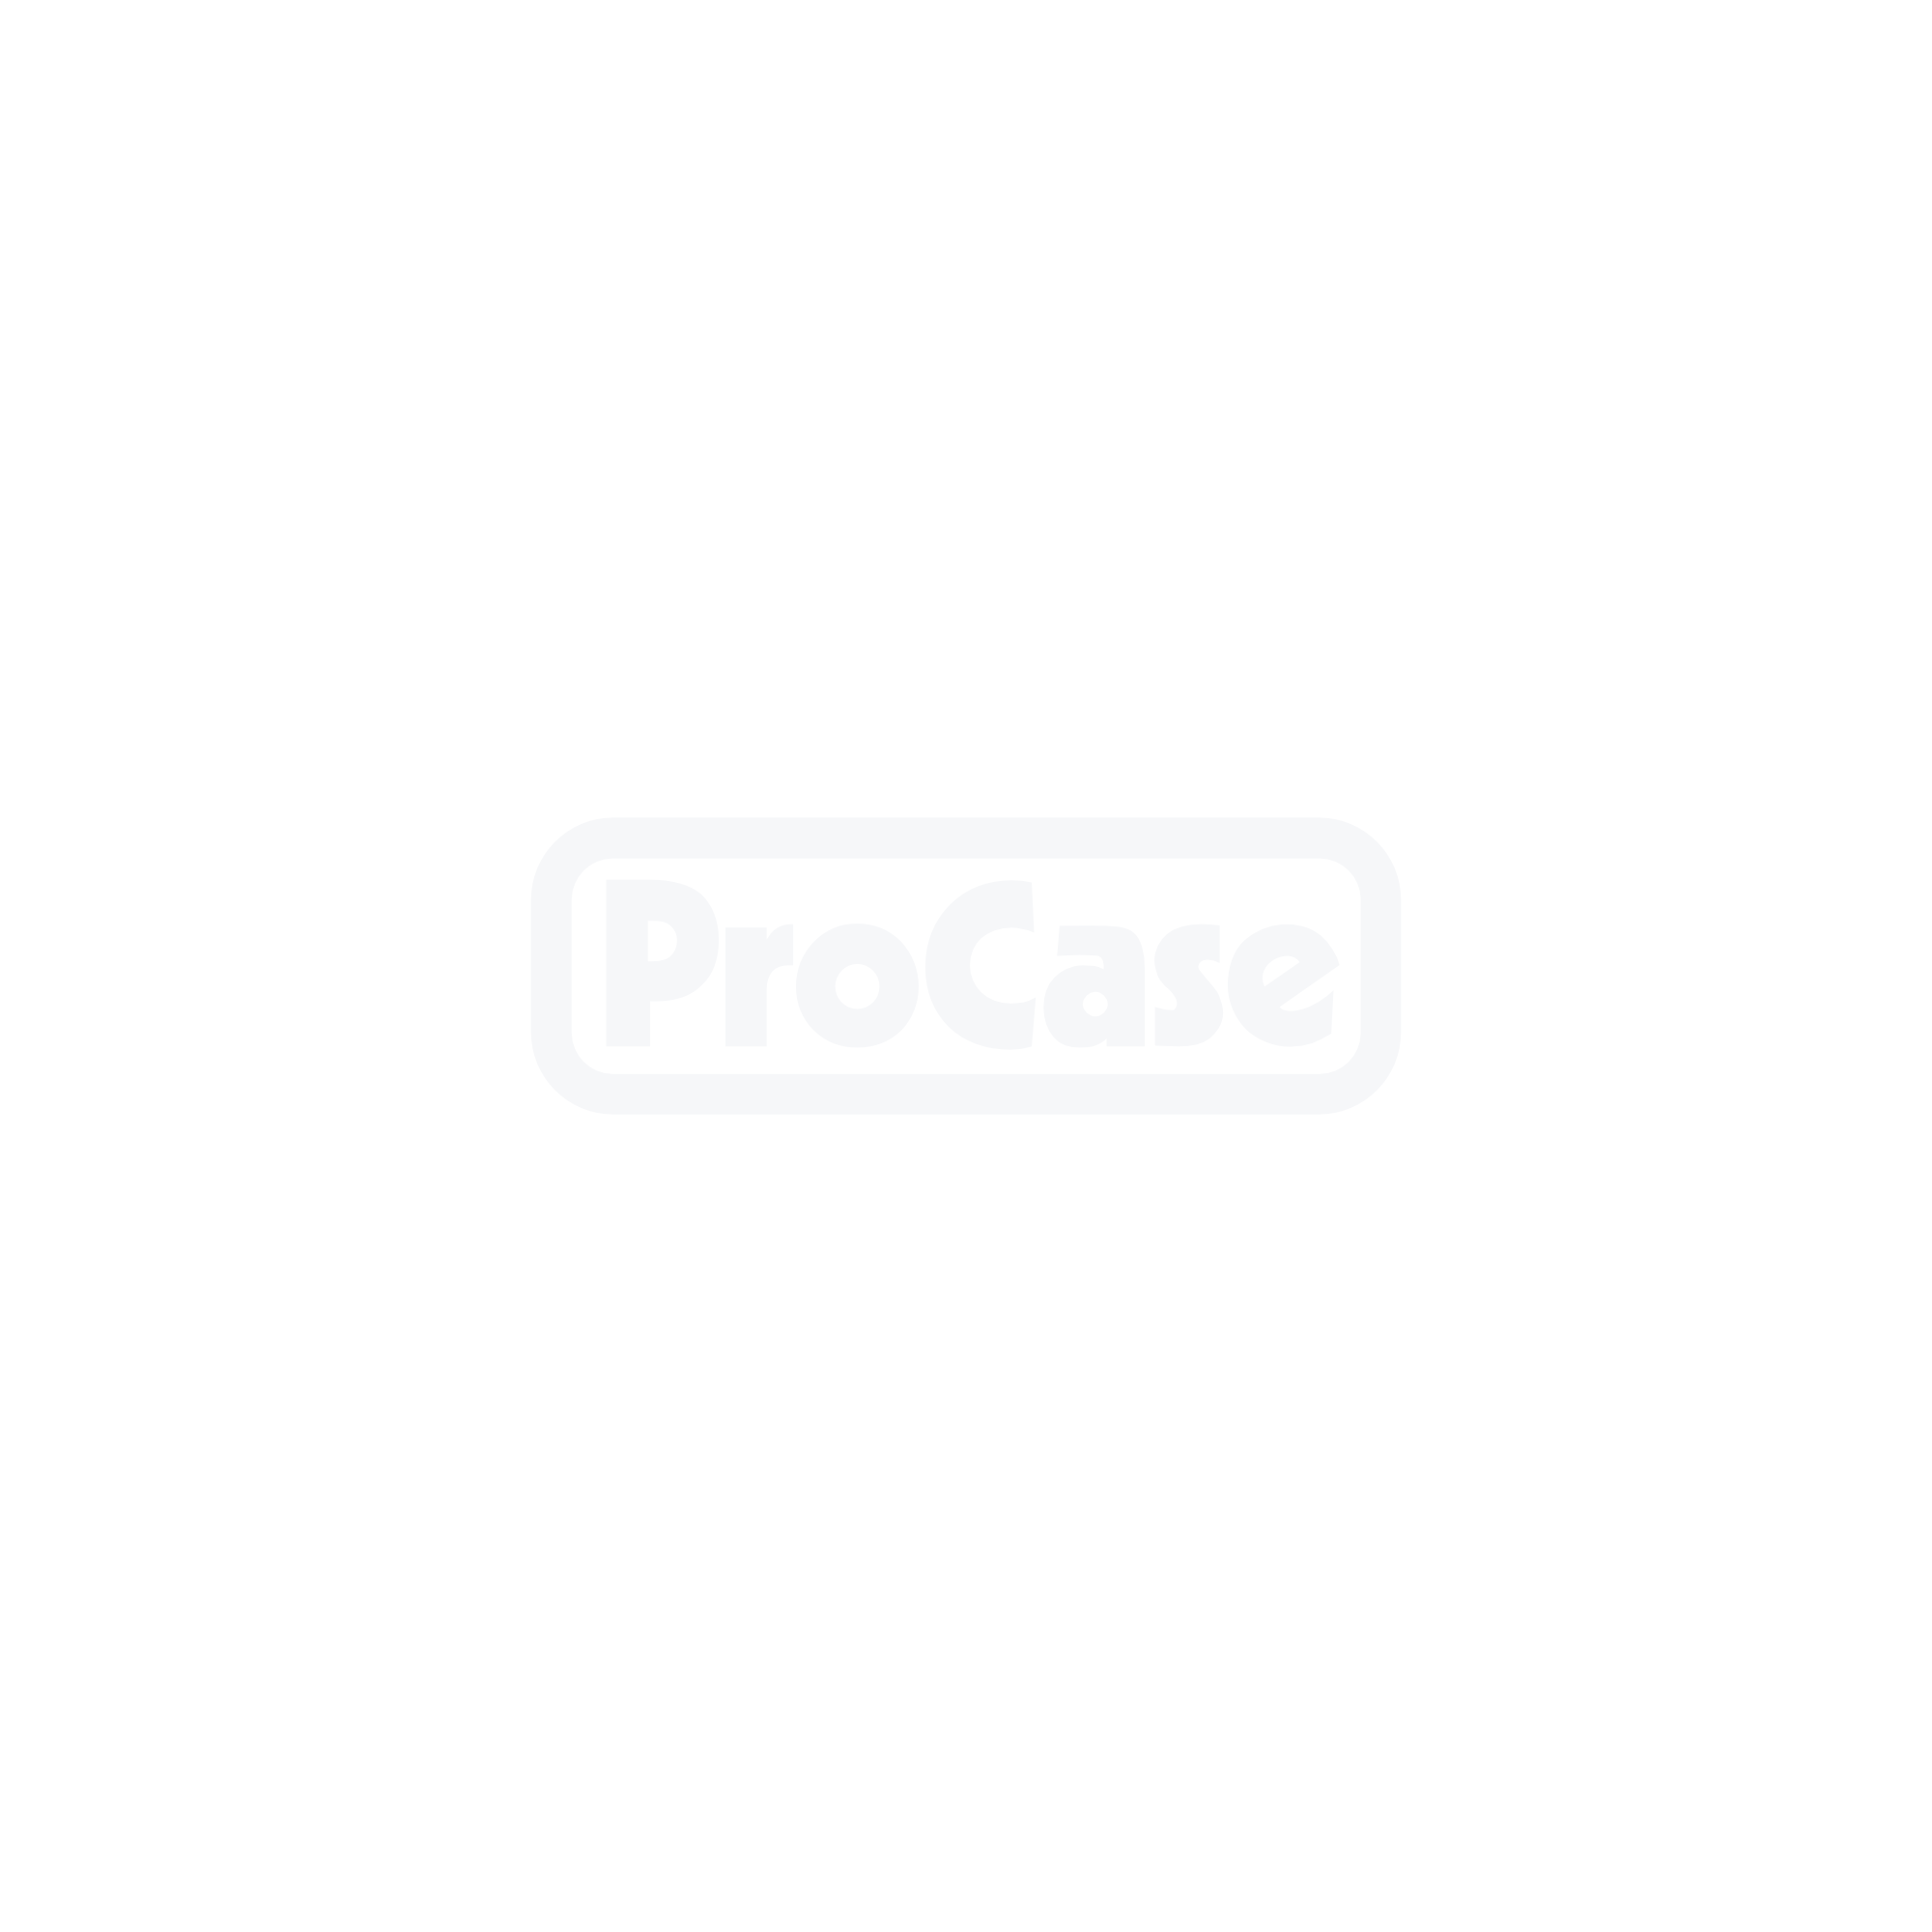 Koffer für 5 Intel Convertible Classmate-PC 3